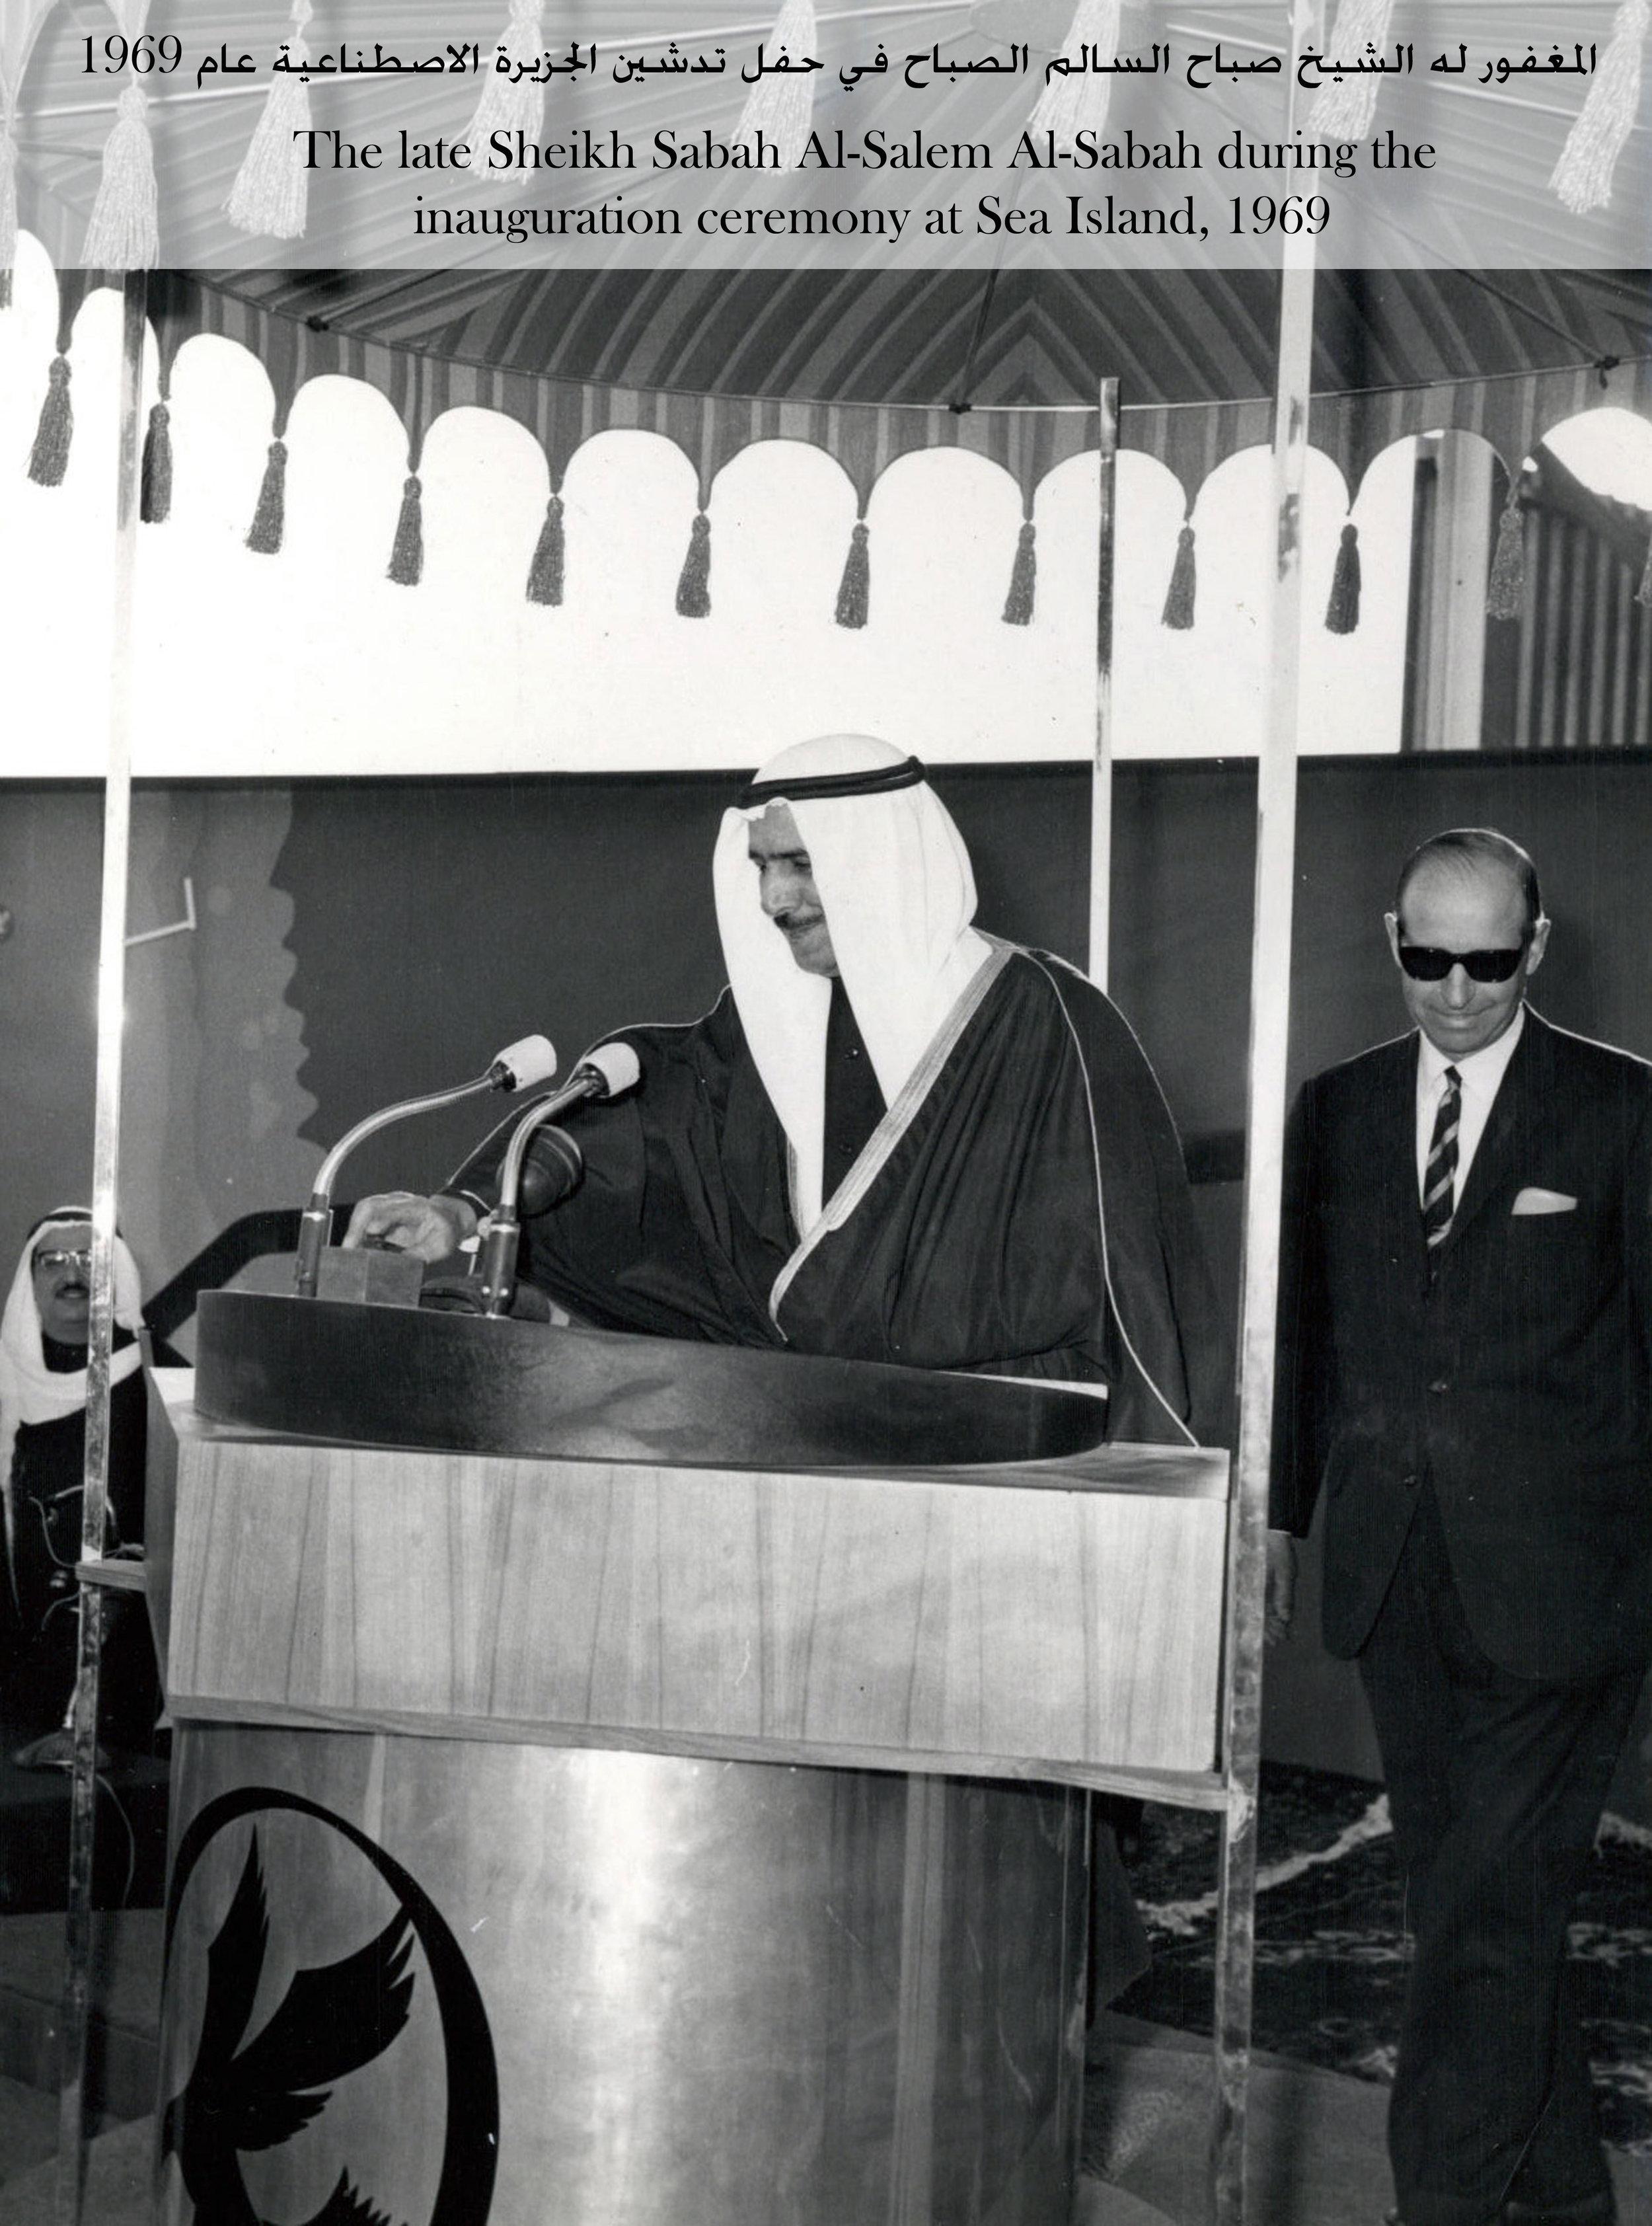 PR15771 Sheikh Salem Ali inauguration of sea island 1969.jpg